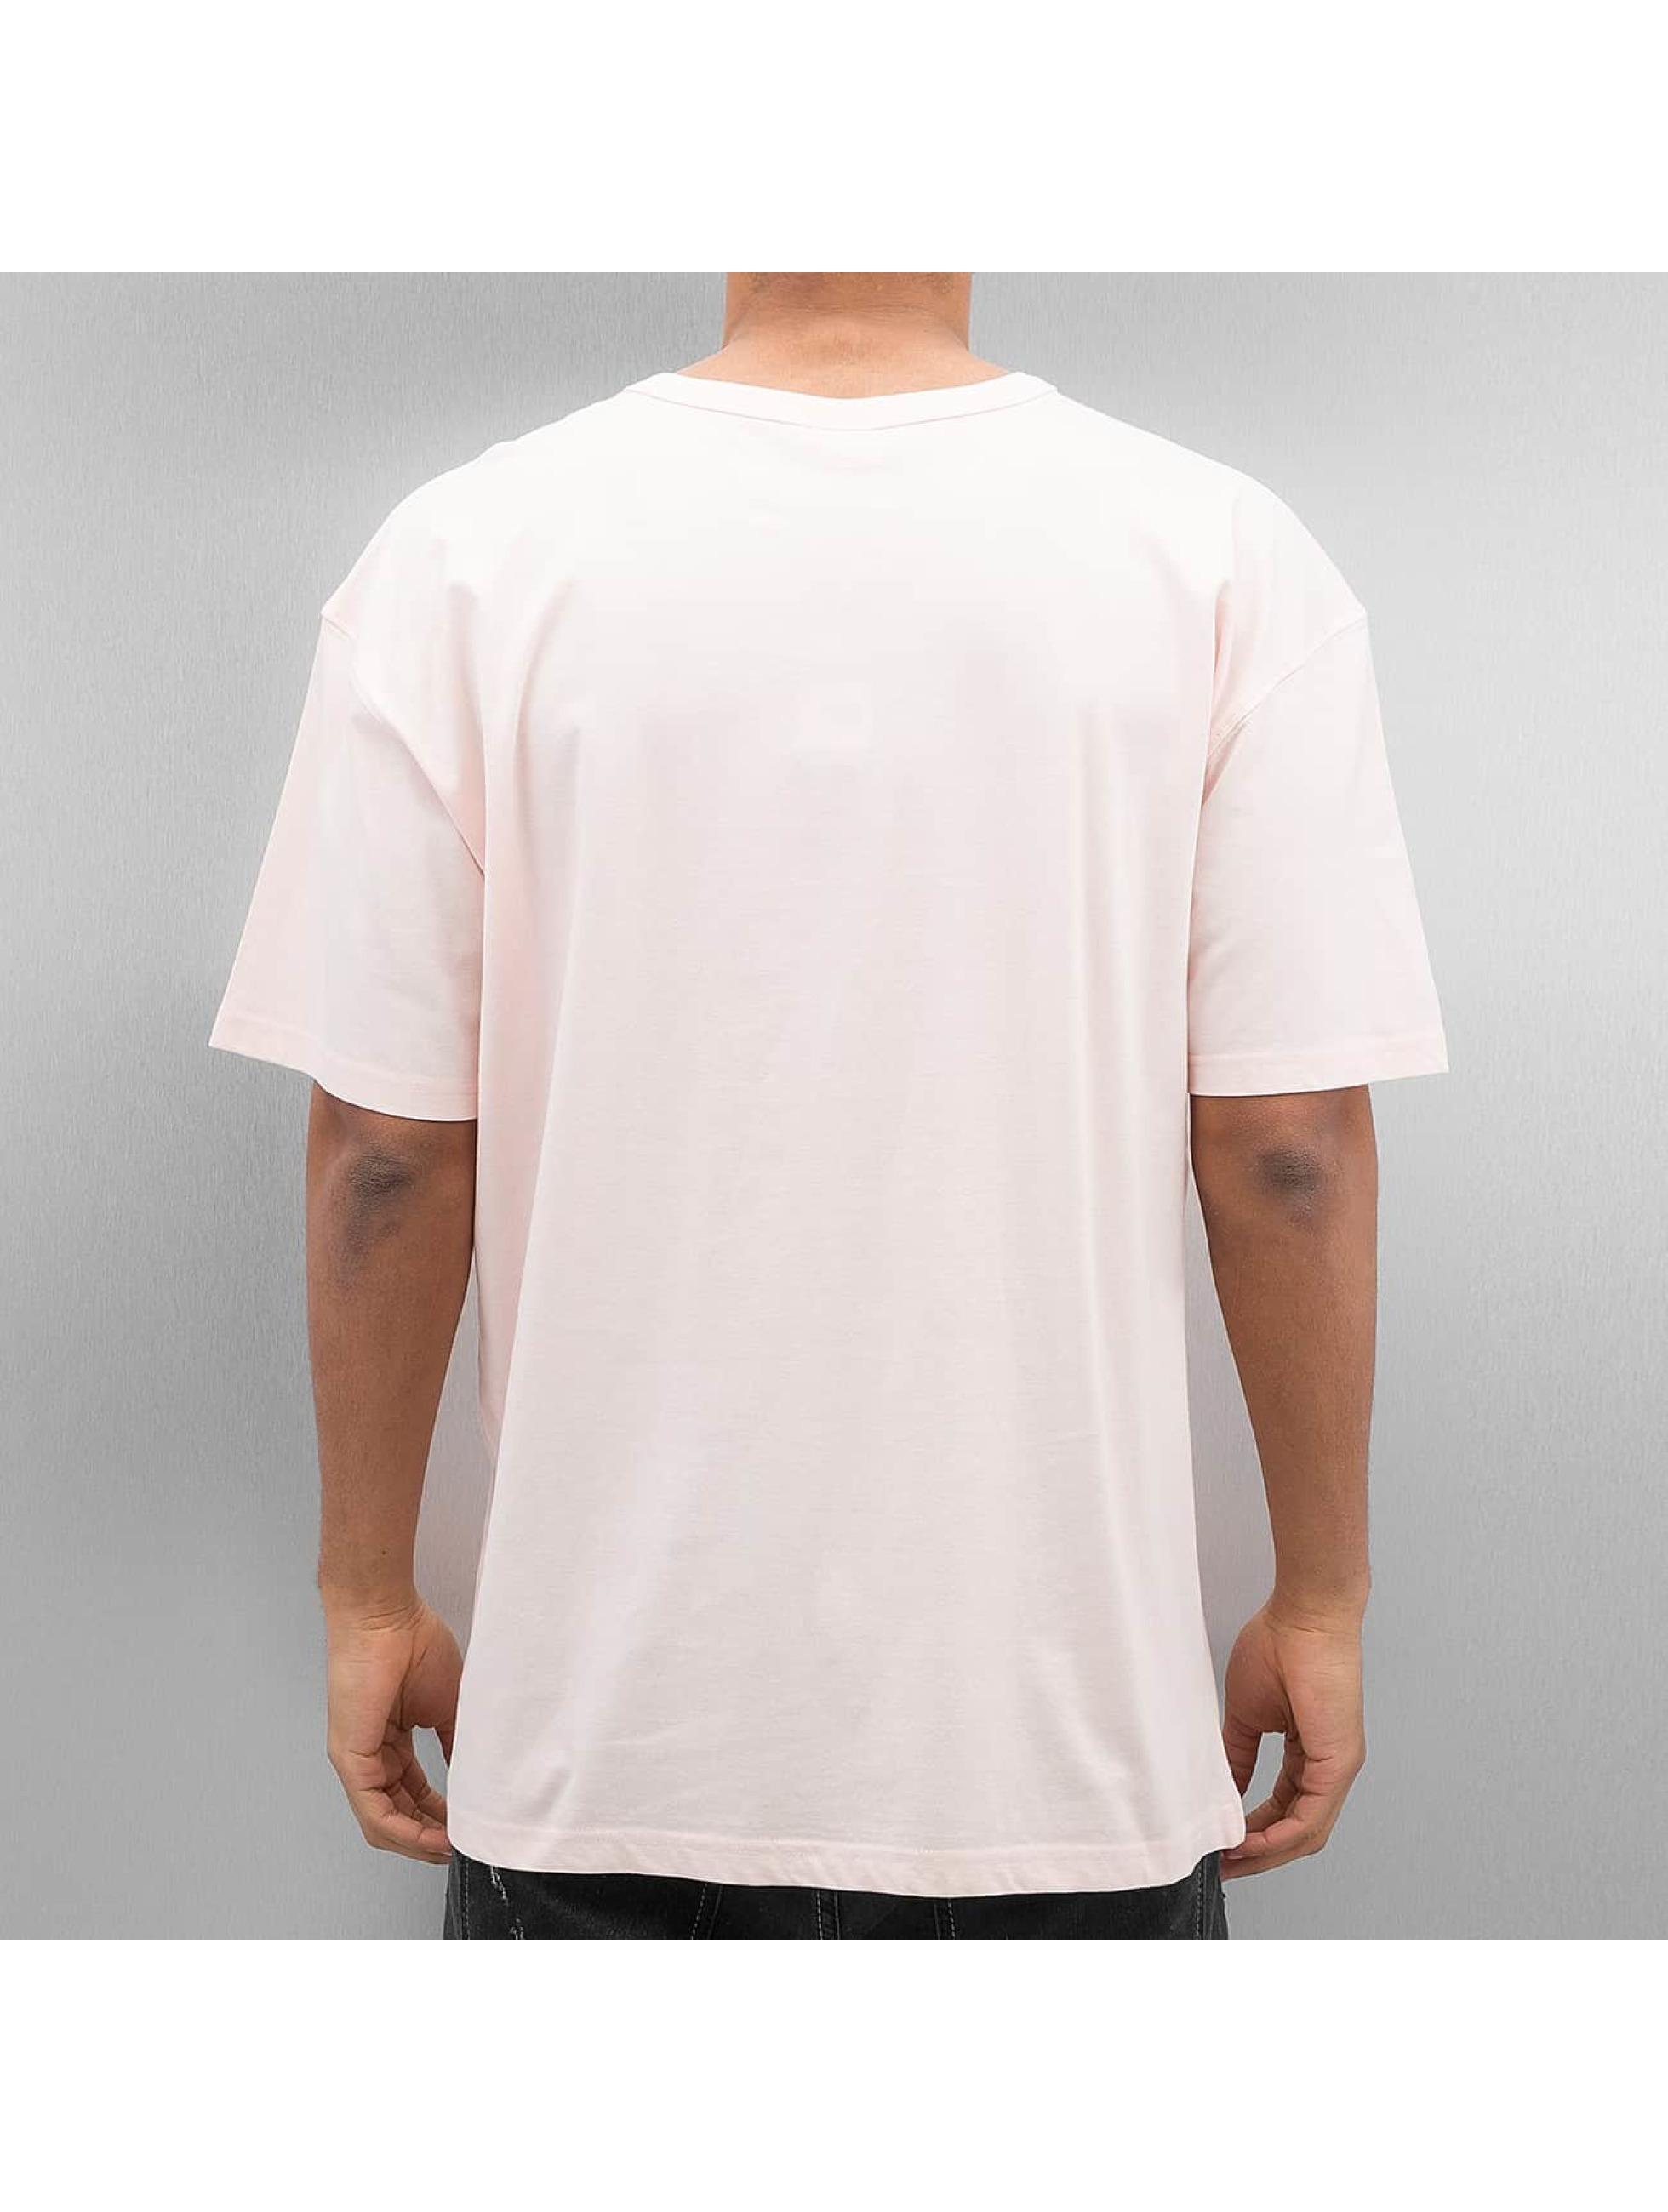 Urban Classics T-Shirt Oversized rose